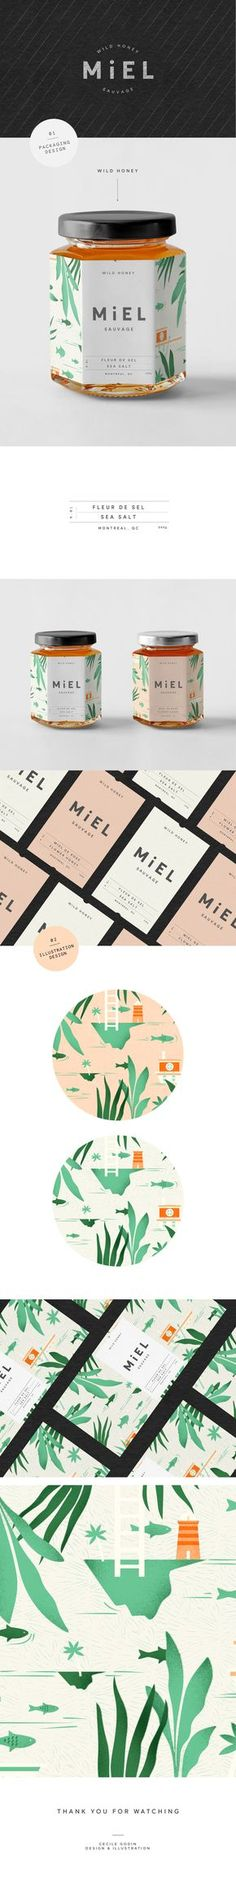 "Popatrz na ten projekt w @Behance: ""Miel Sauvage"" https://www.behance.net/gallery/46446369/Miel-Sauvage"